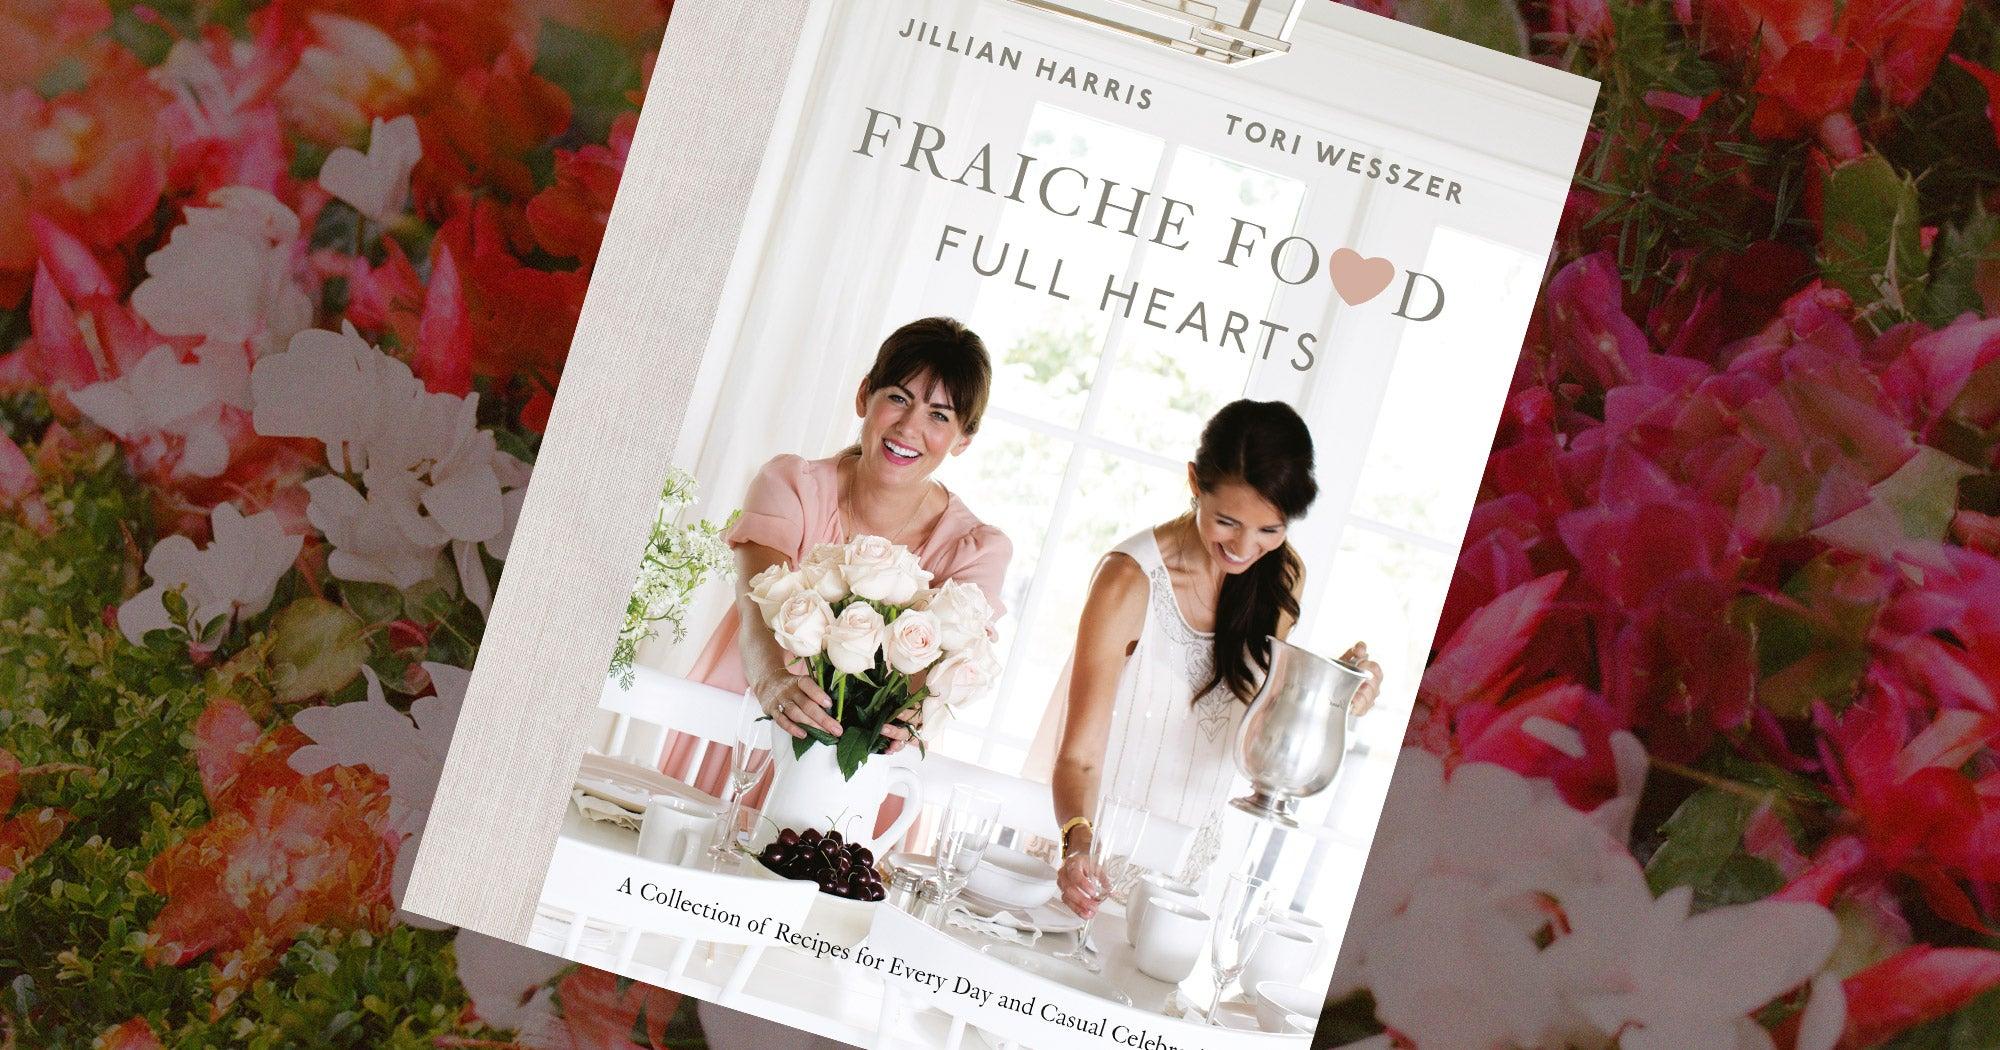 5 Plant-Based Fall Recipes From Jillian Harris's New Cookbook